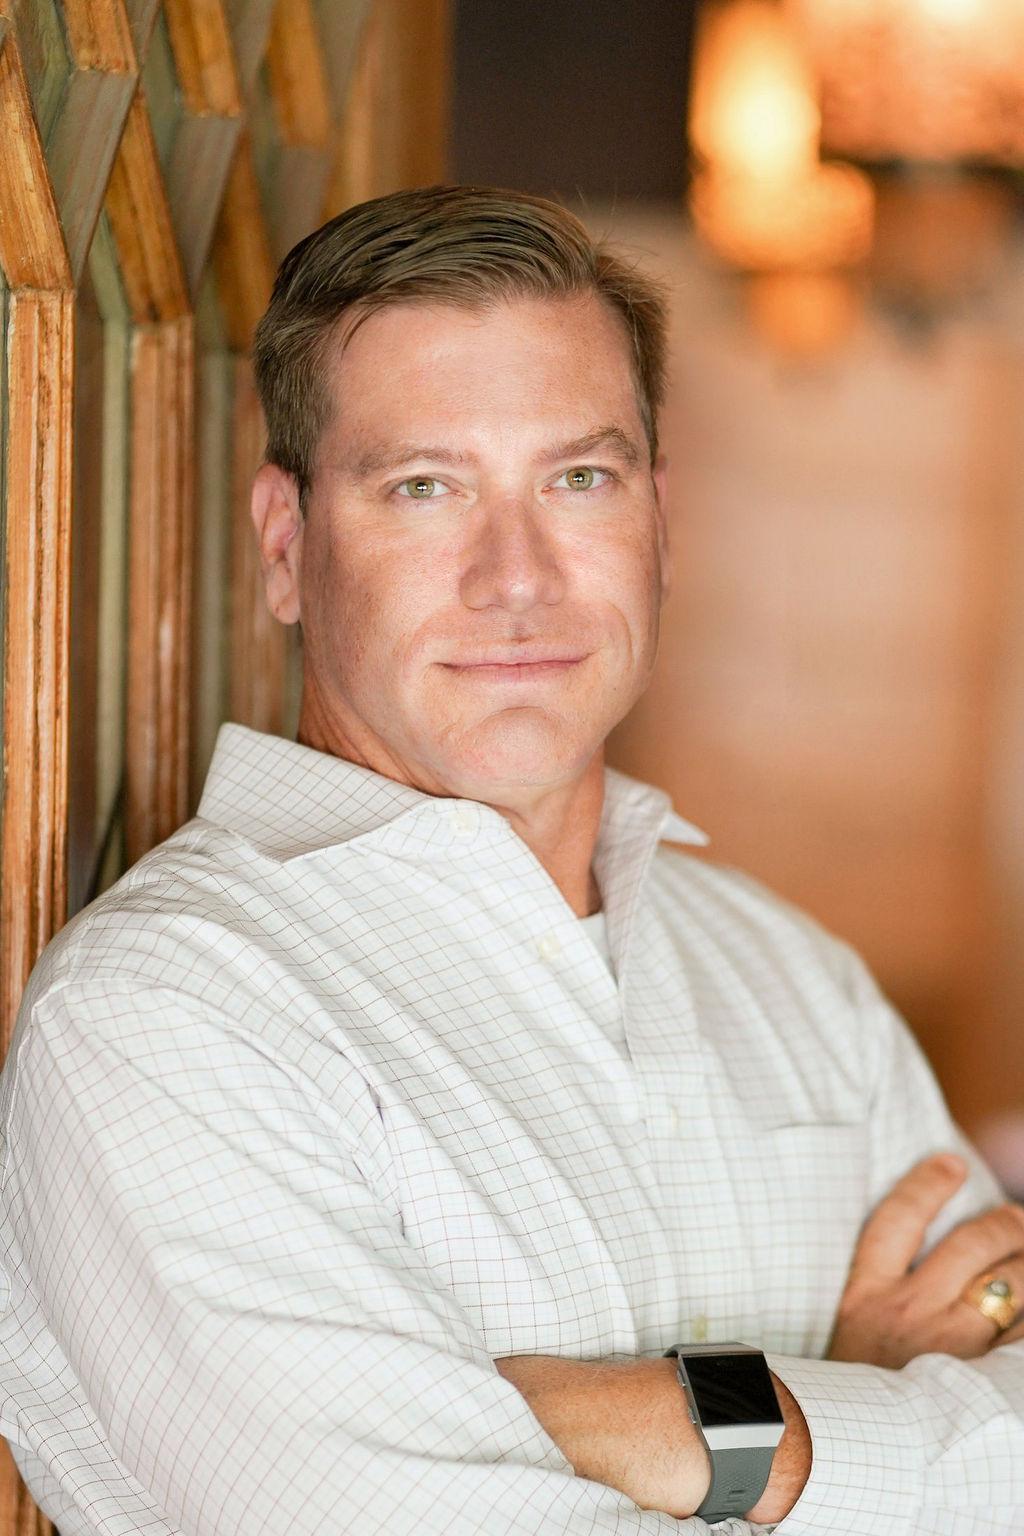 Richard Morrison, attorney, photo